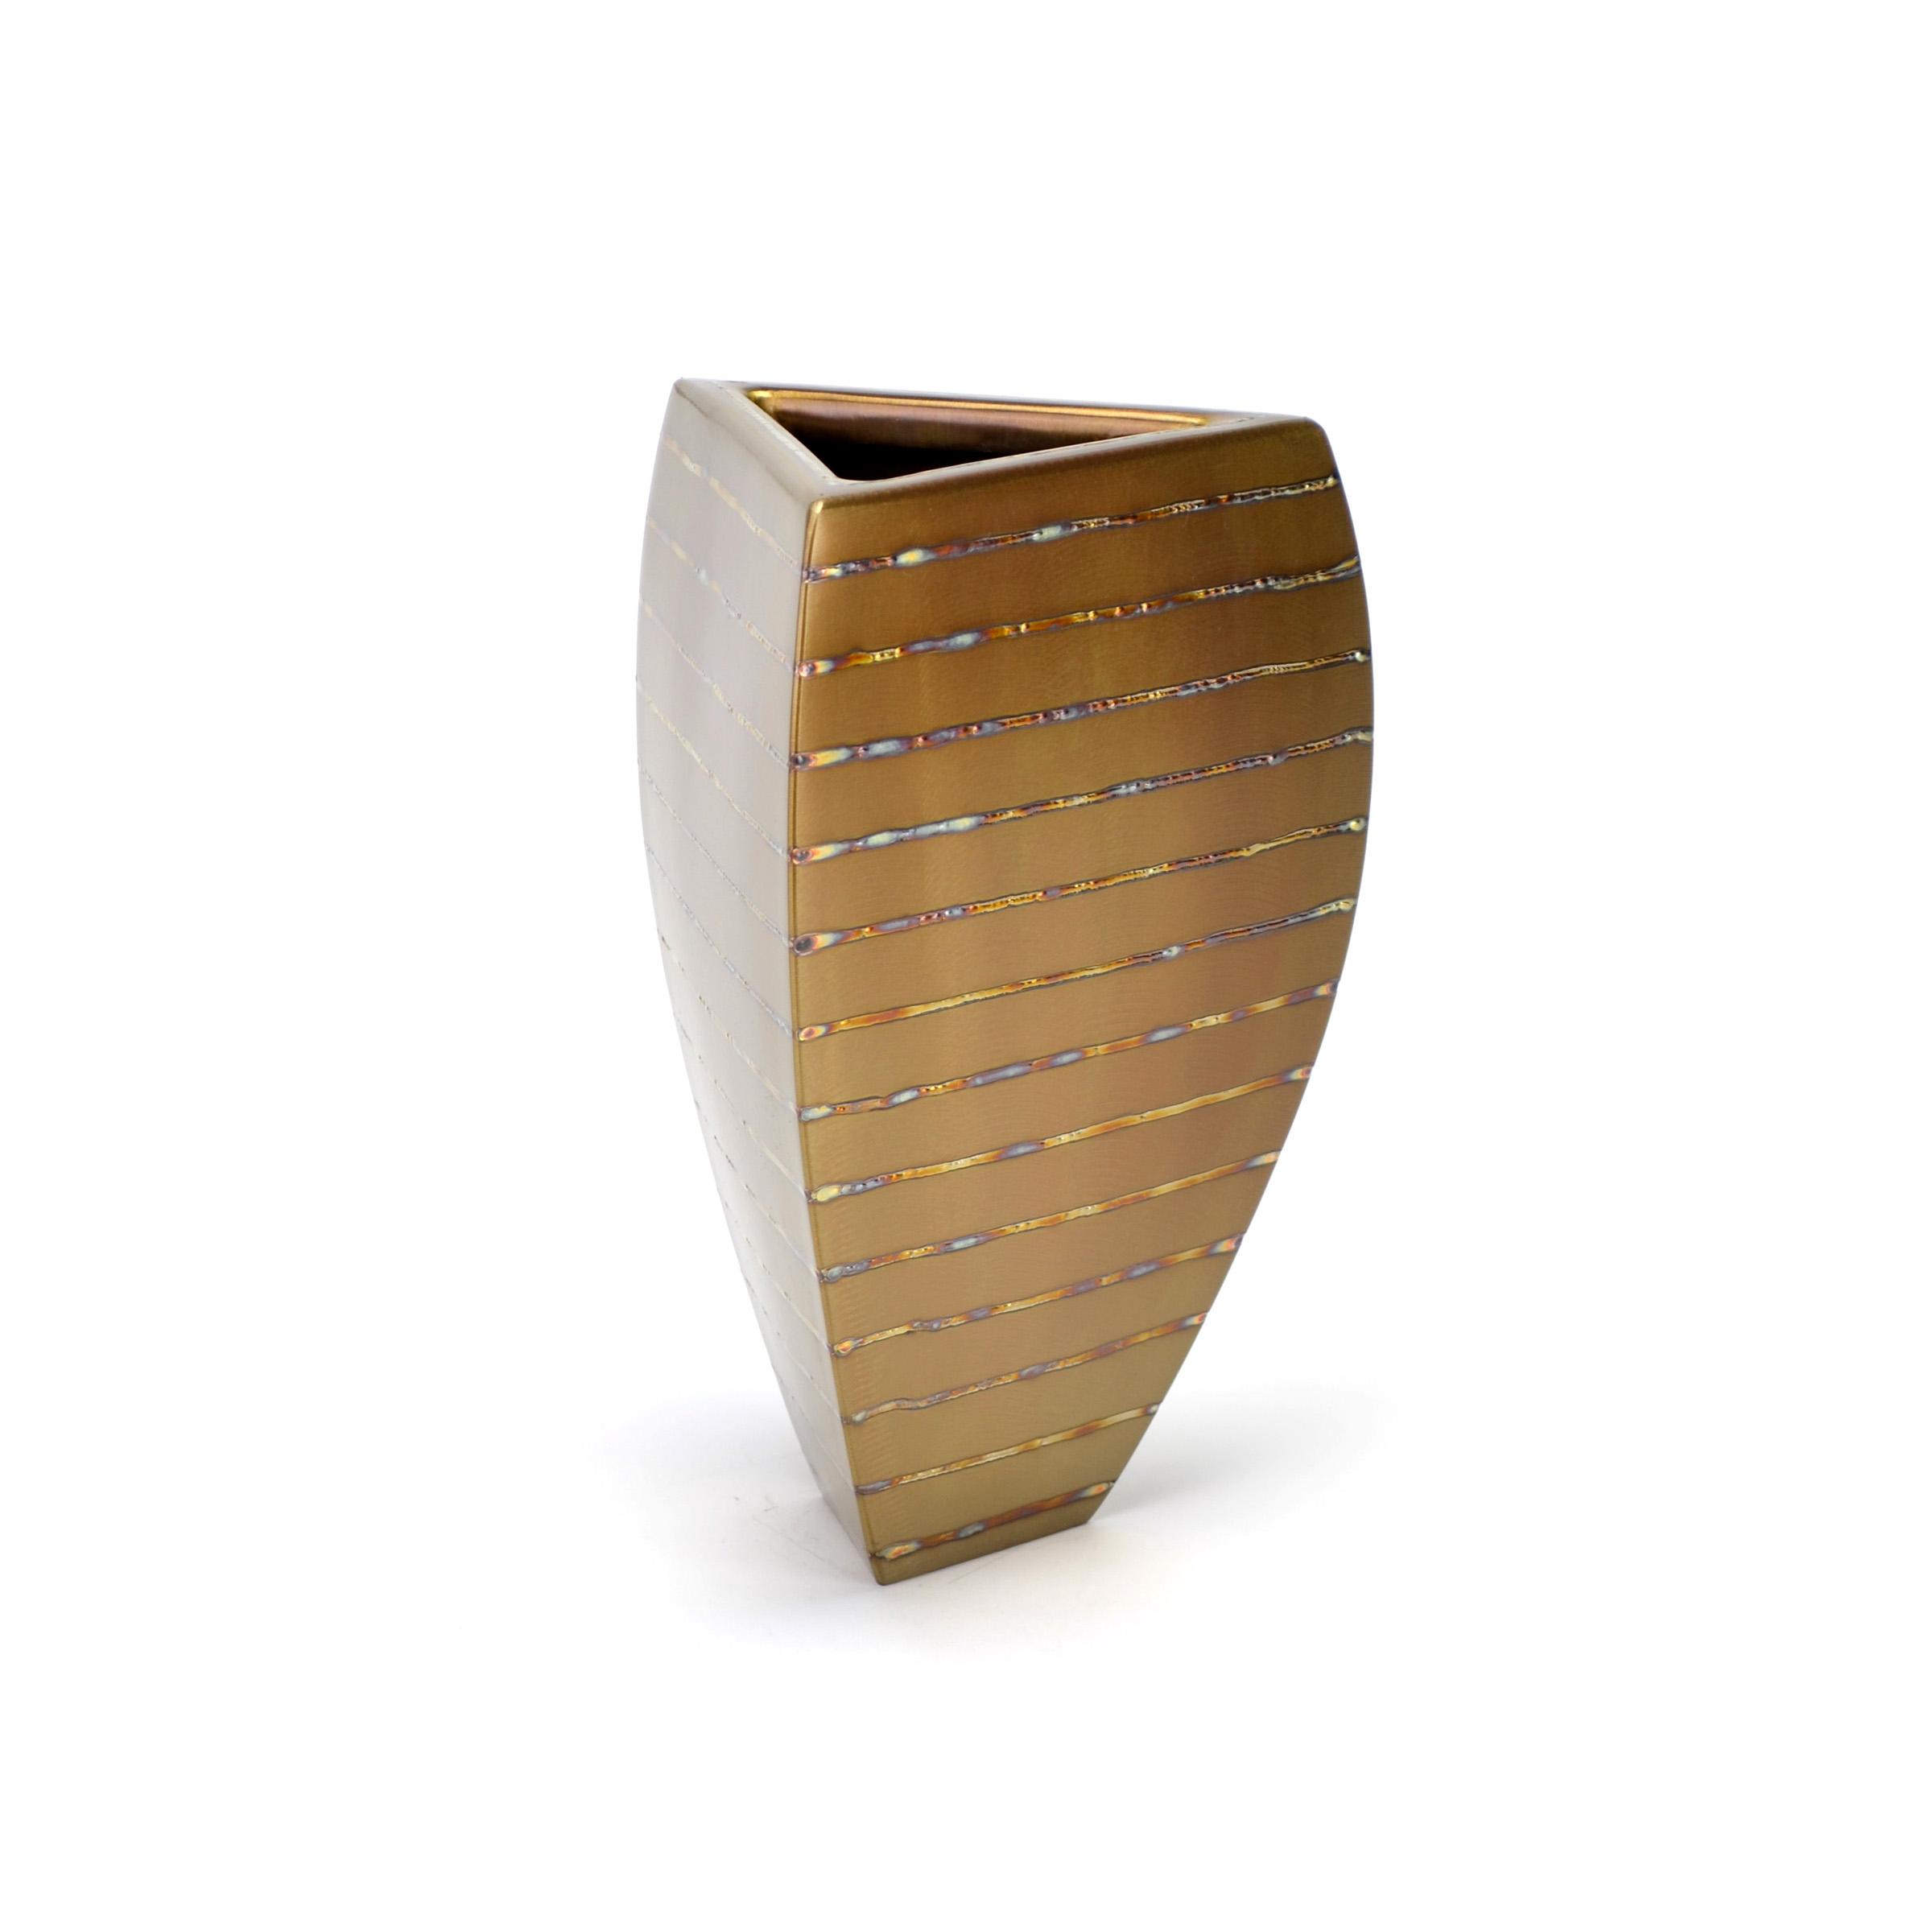 "Tri-Bowl - horizontal heat stripe , 10 x 7"" x 7"", Stainless Steel"